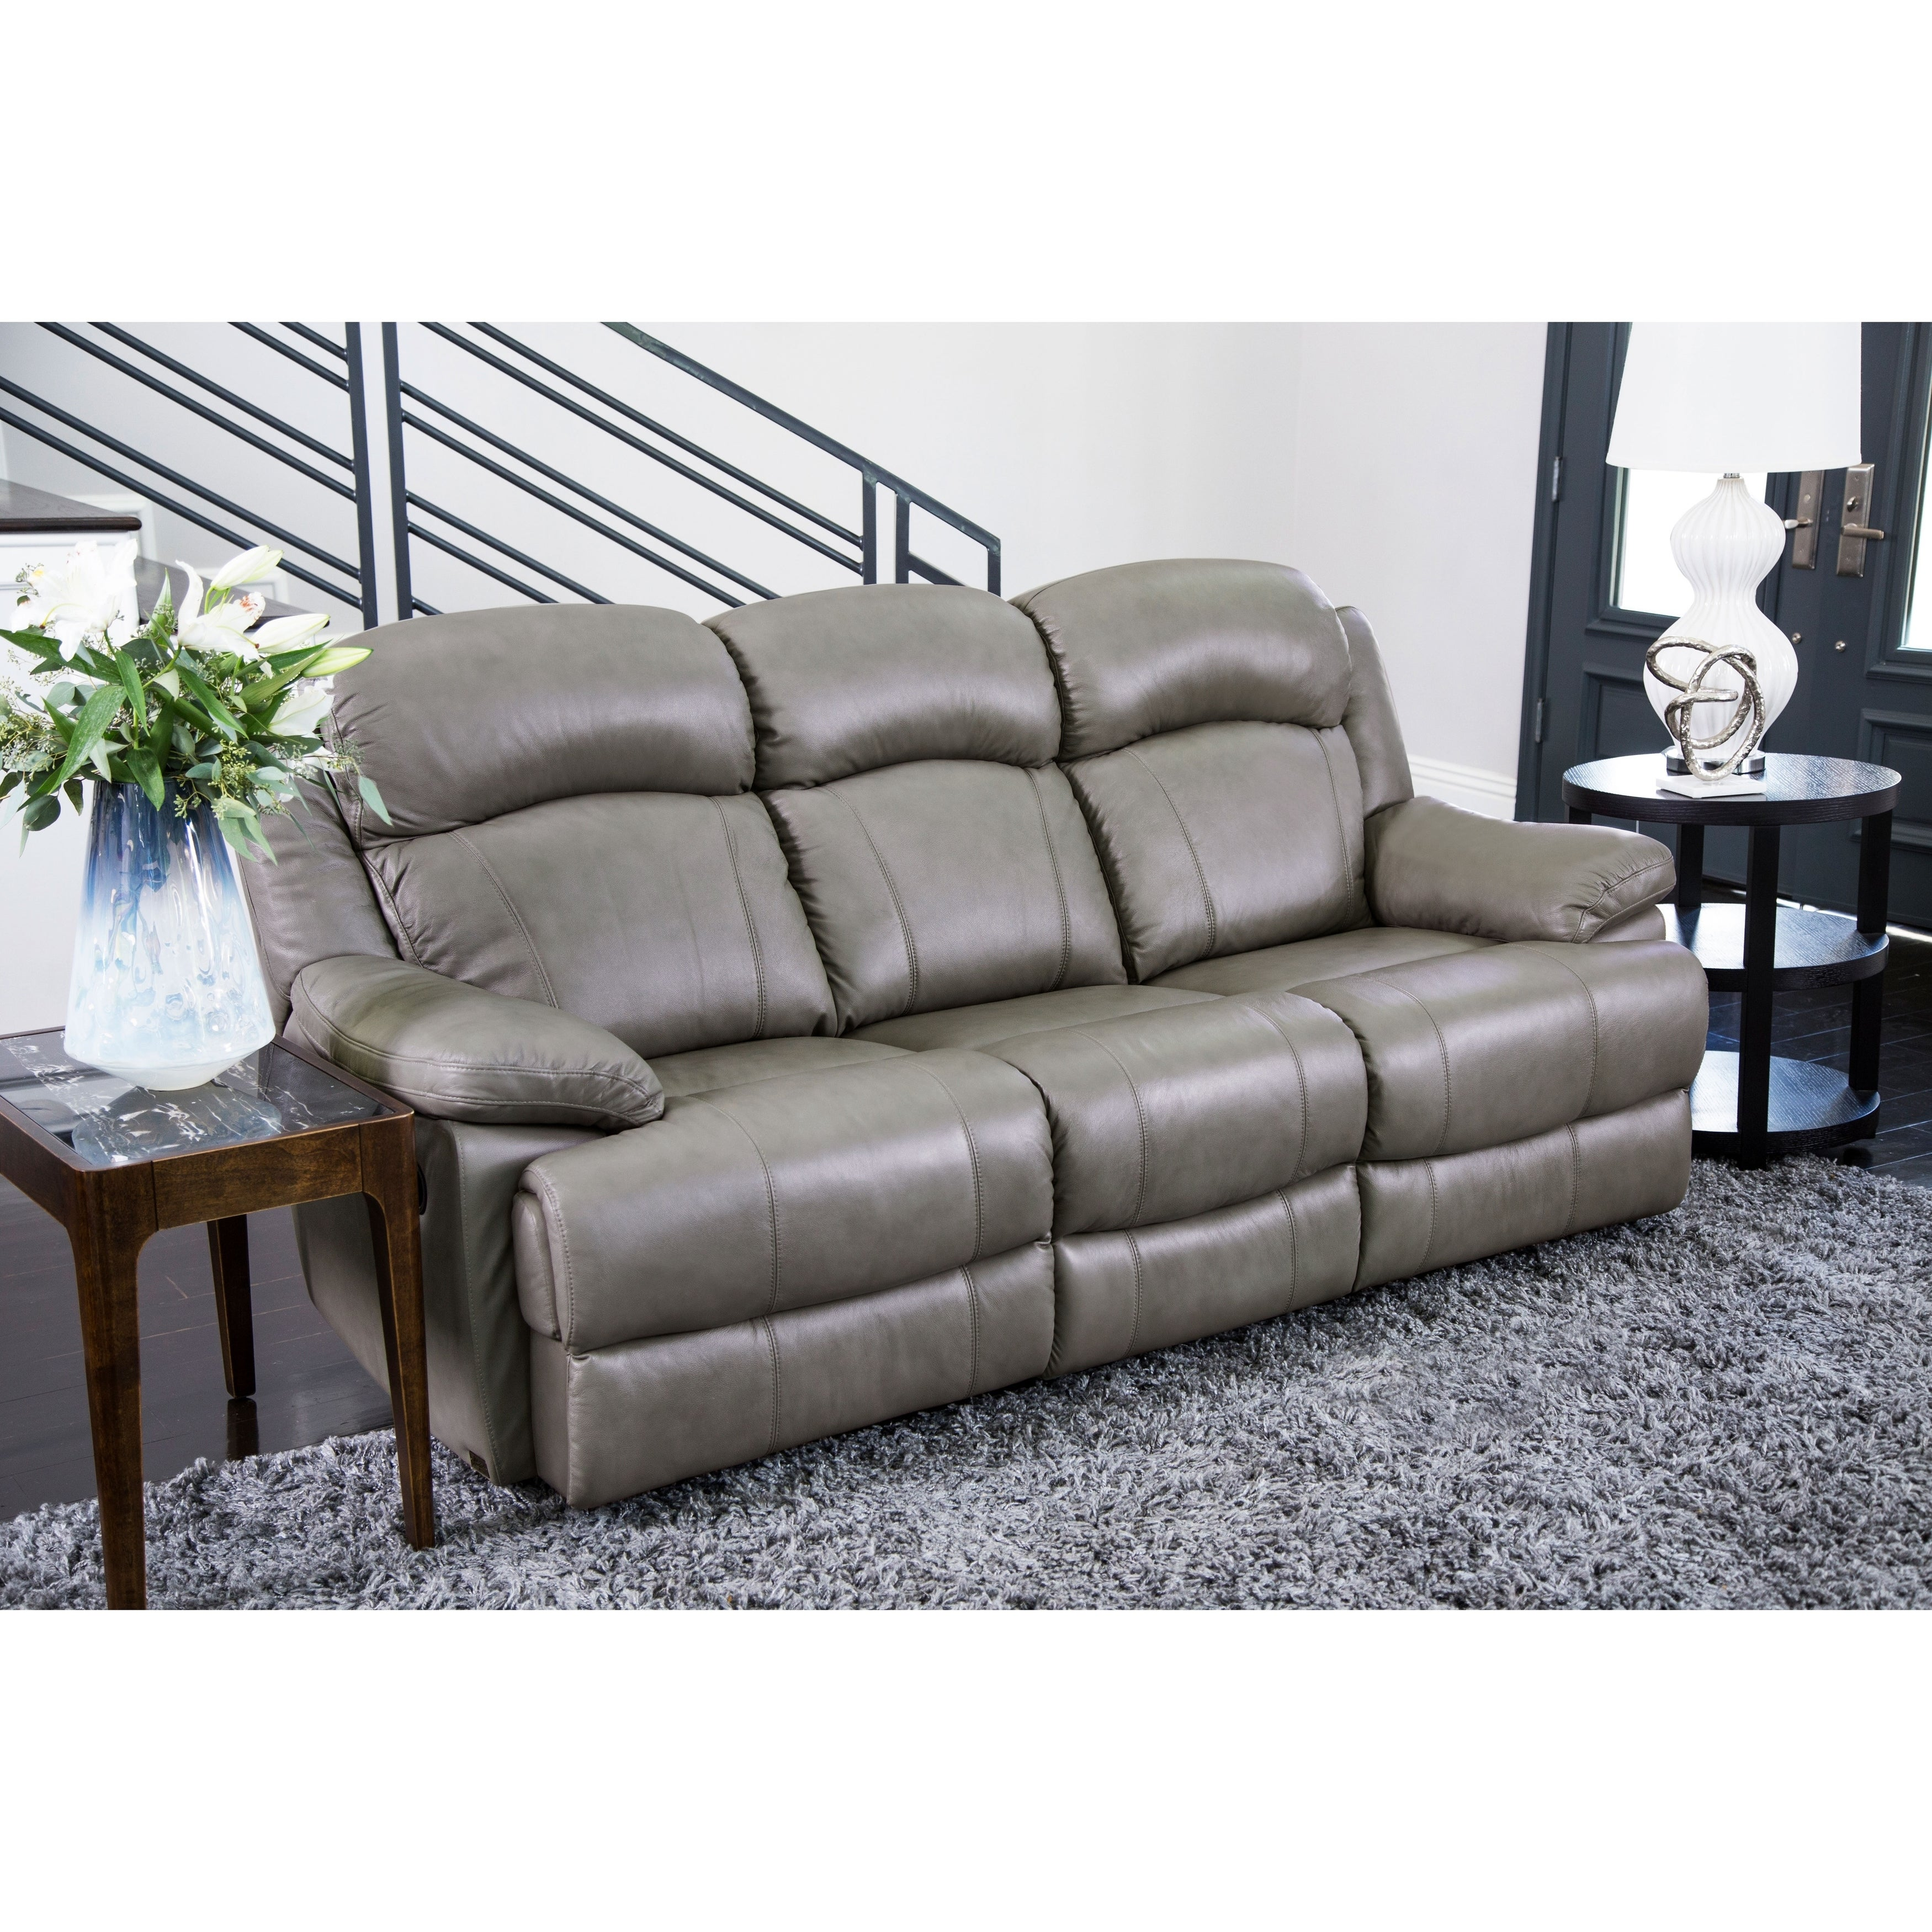 Abbyson Clarence Top Grain Leather Reclining Sofa (Grey)